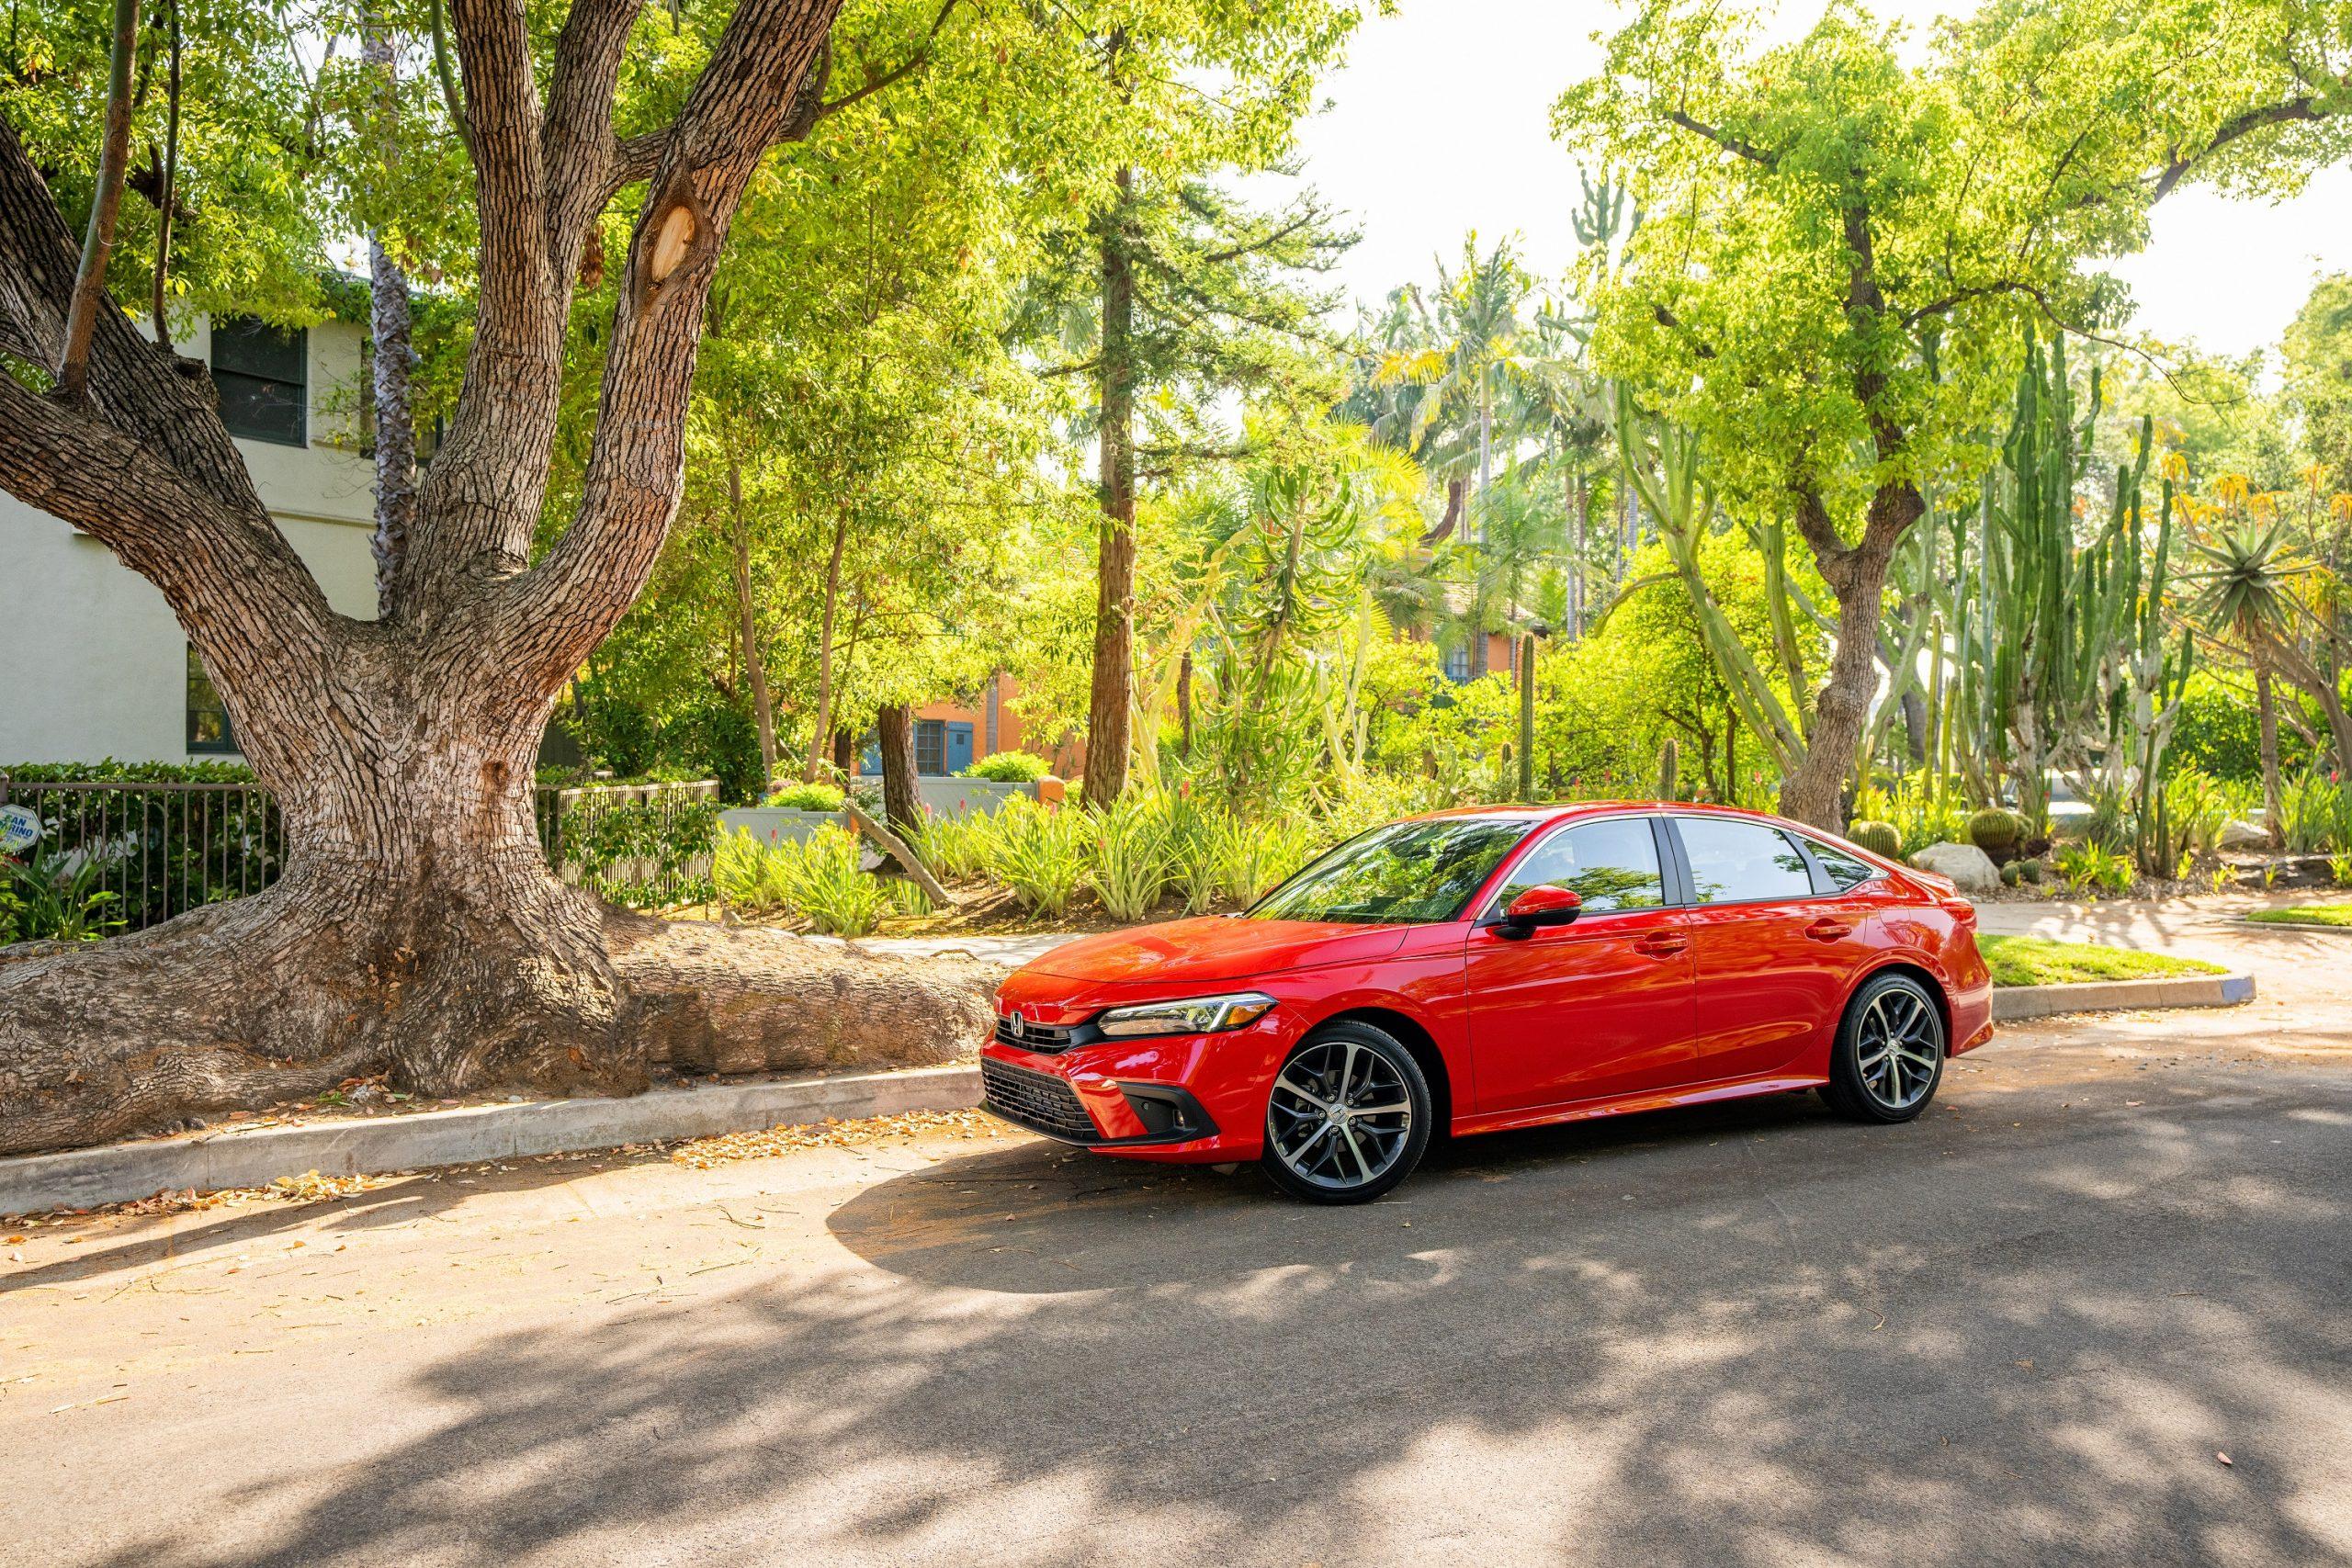 A red 2022 Honda Civic sedan parked on a city street